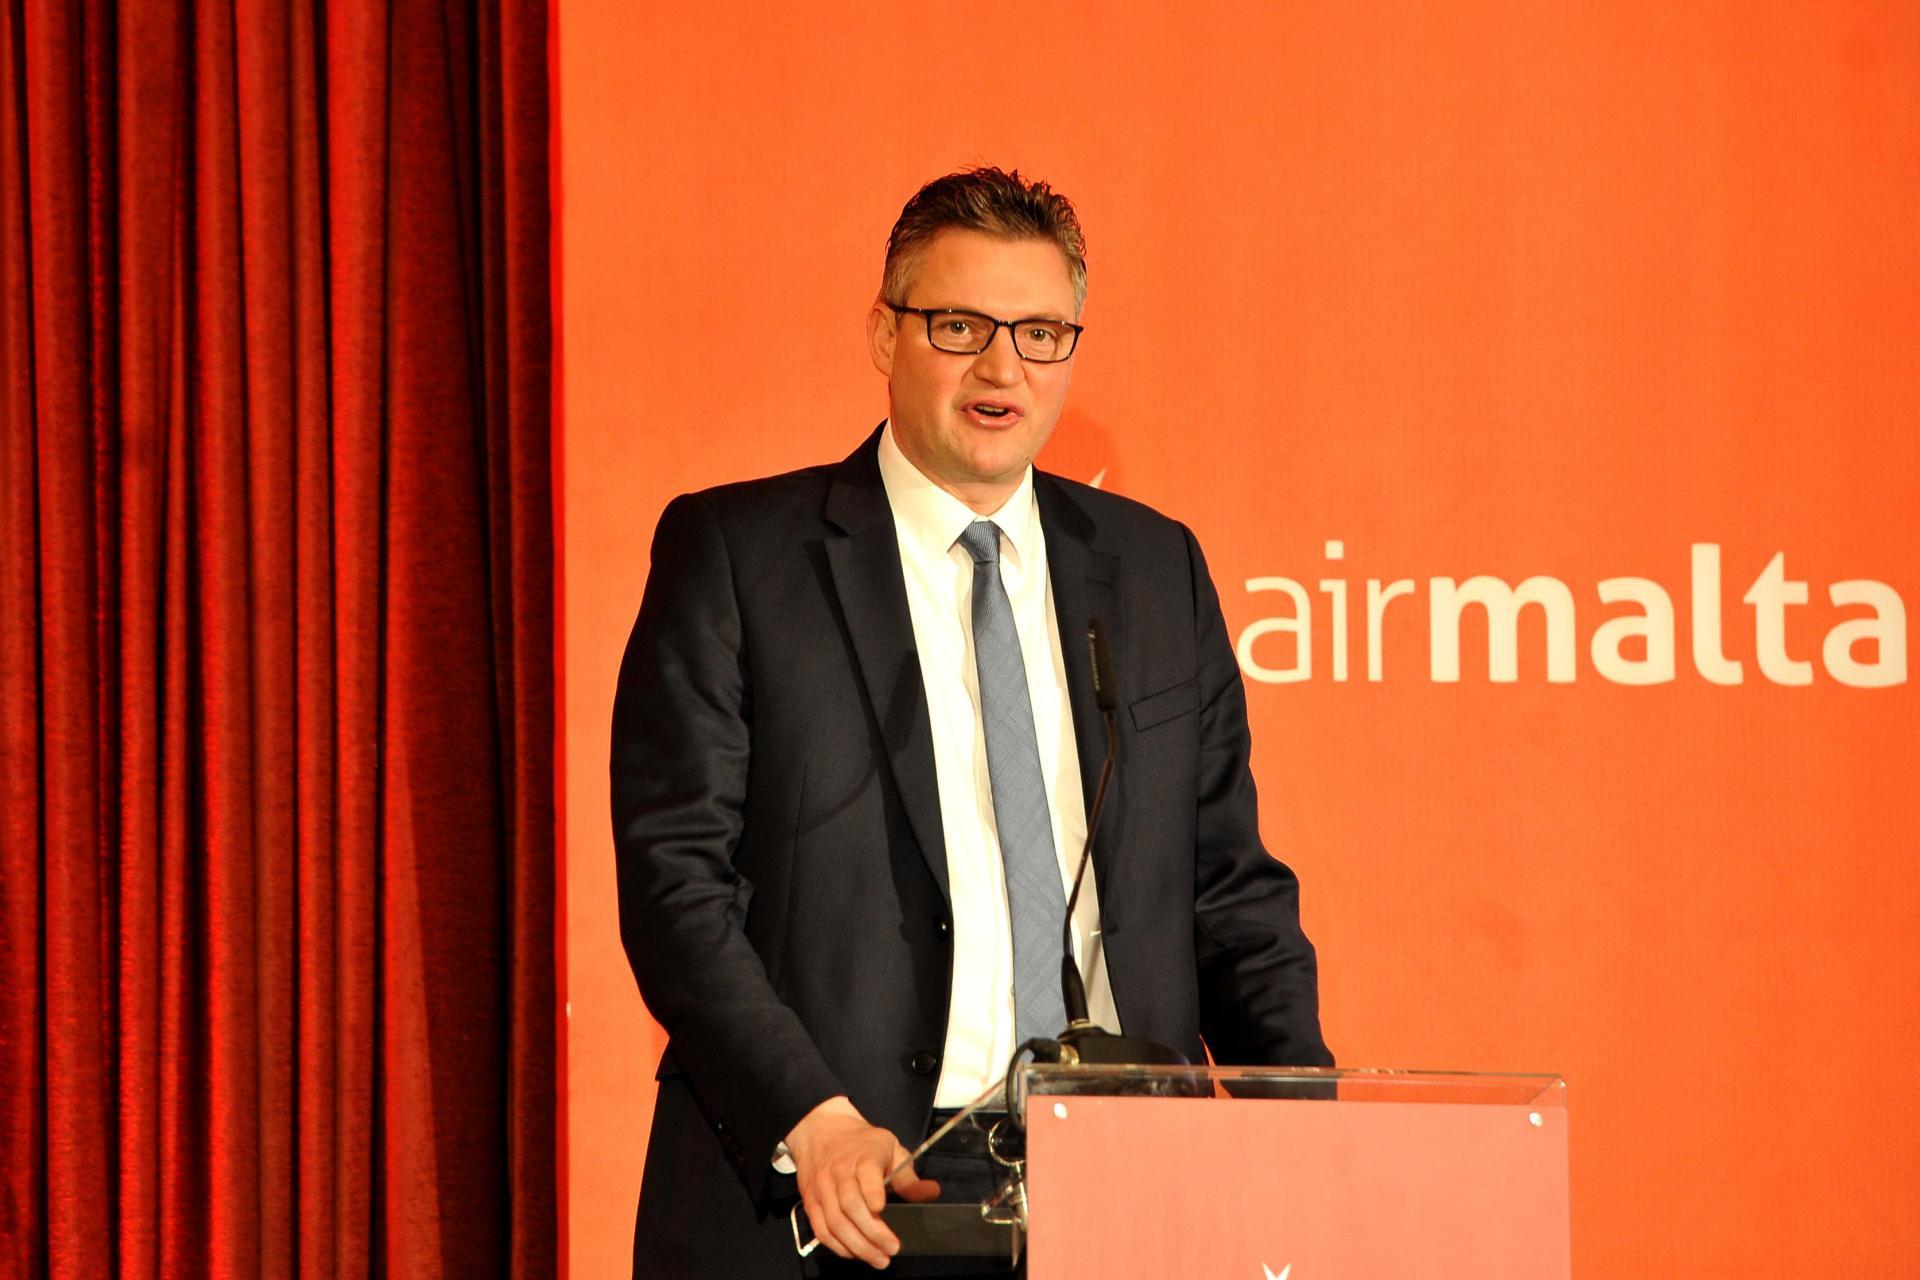 Tourism Minister Konrad Mizzi. Photo: Chris Sant Fournier